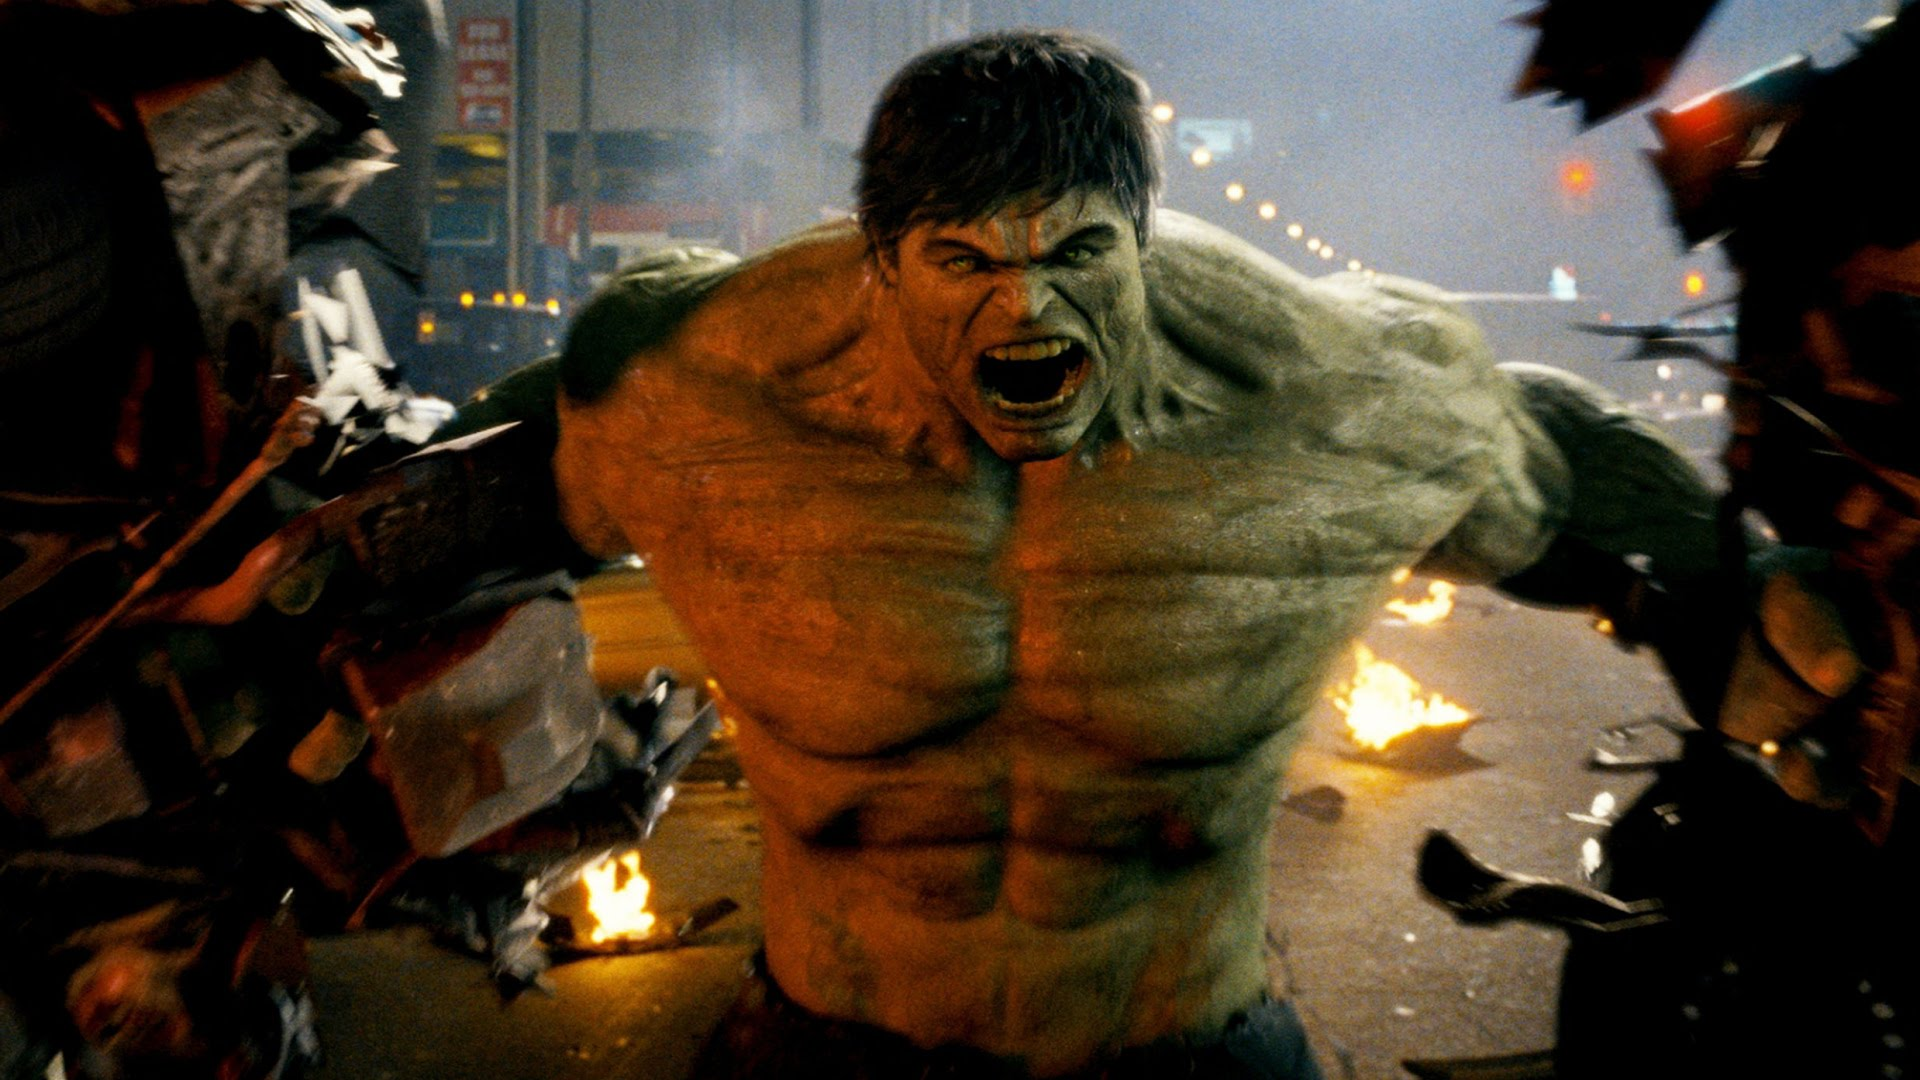 O Incrivel Hulk 2008